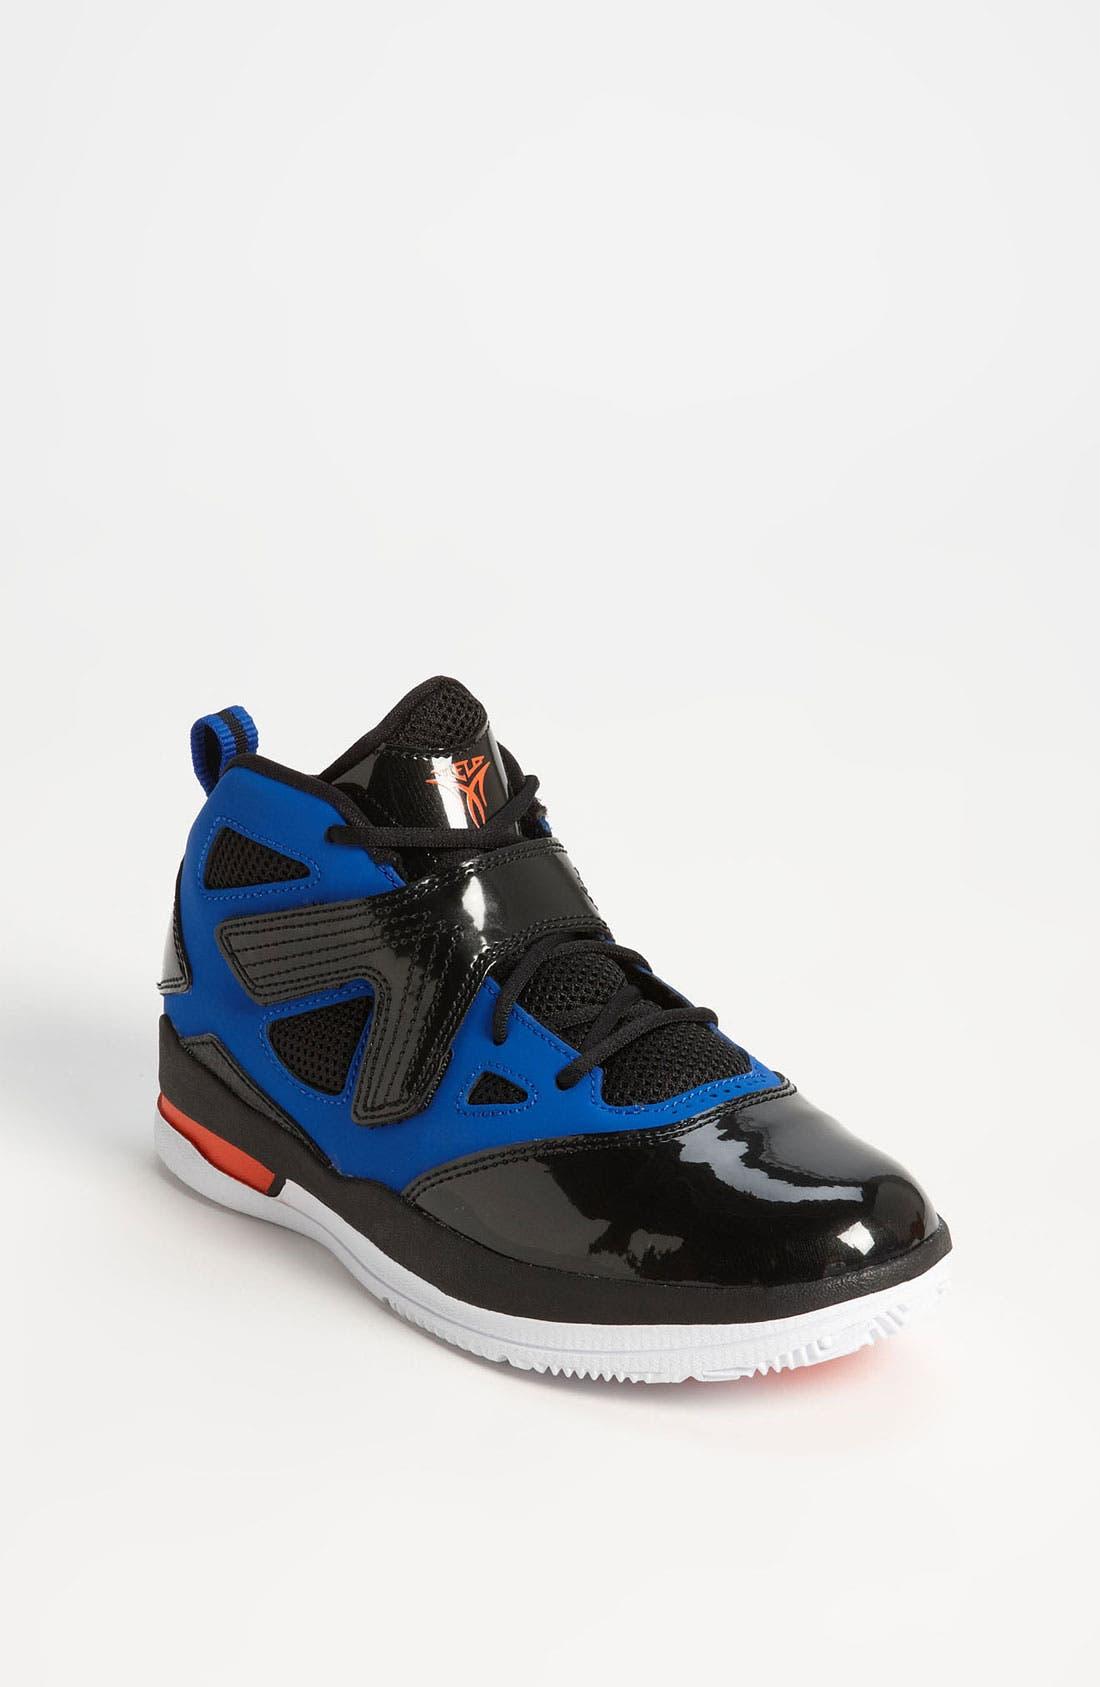 Alternate Image 1 Selected - Nike 'Jordan Melo M9' Basketball Shoe (Toddler & Little Kid)